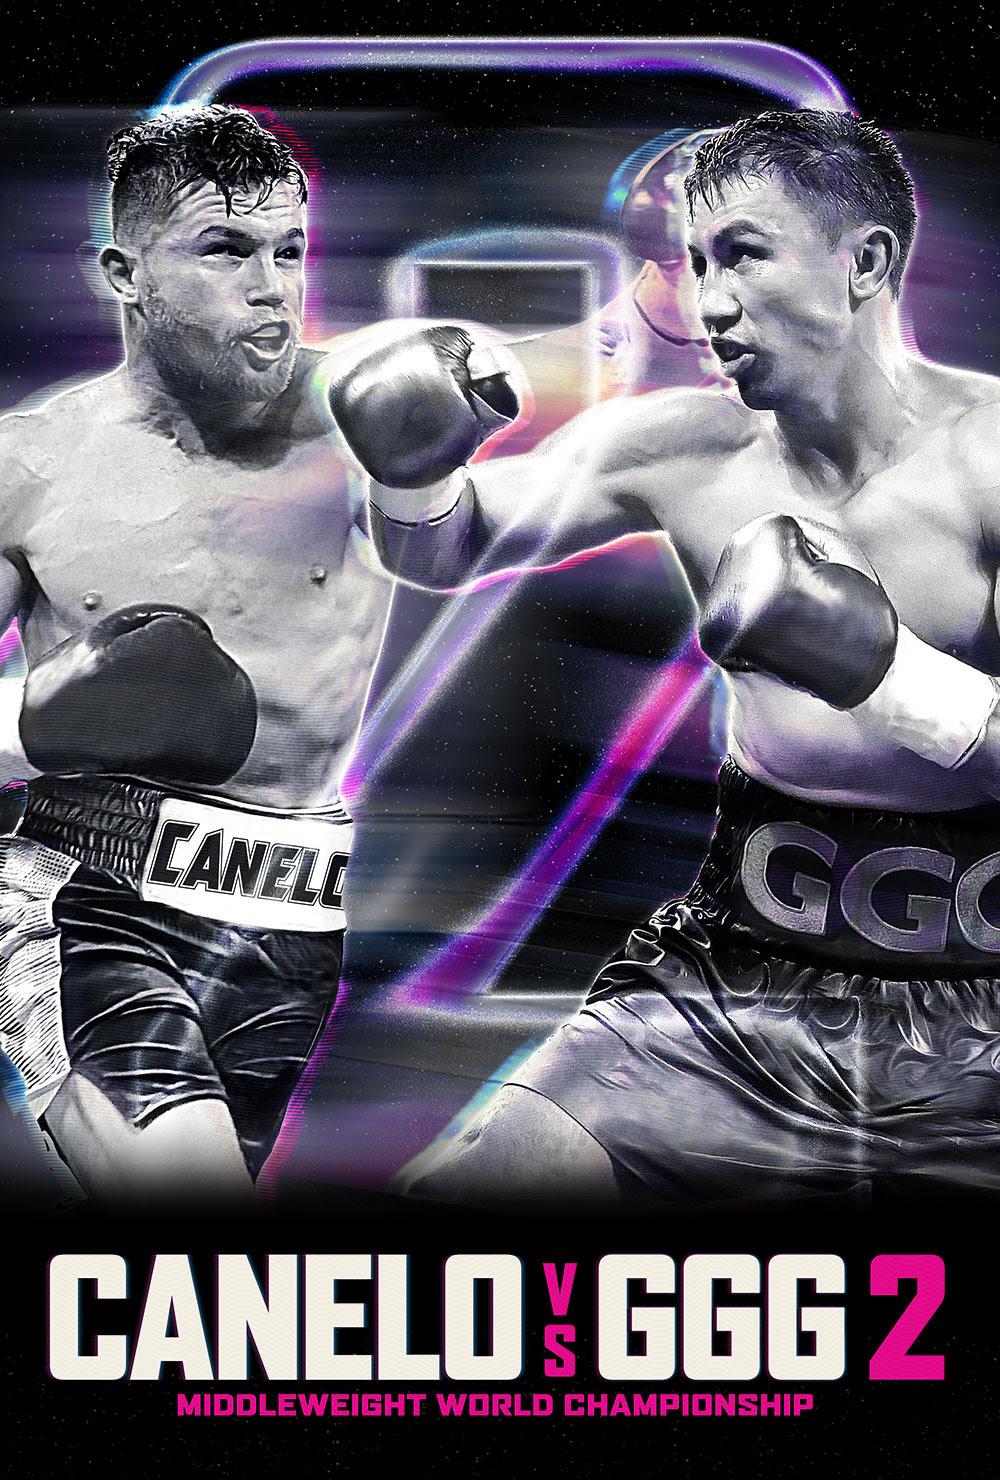 Cinépolis presenta: 'Canelo vs. GGG 2' – La Revancha Entre Canelo Álvarez Y Gennady Golovkin